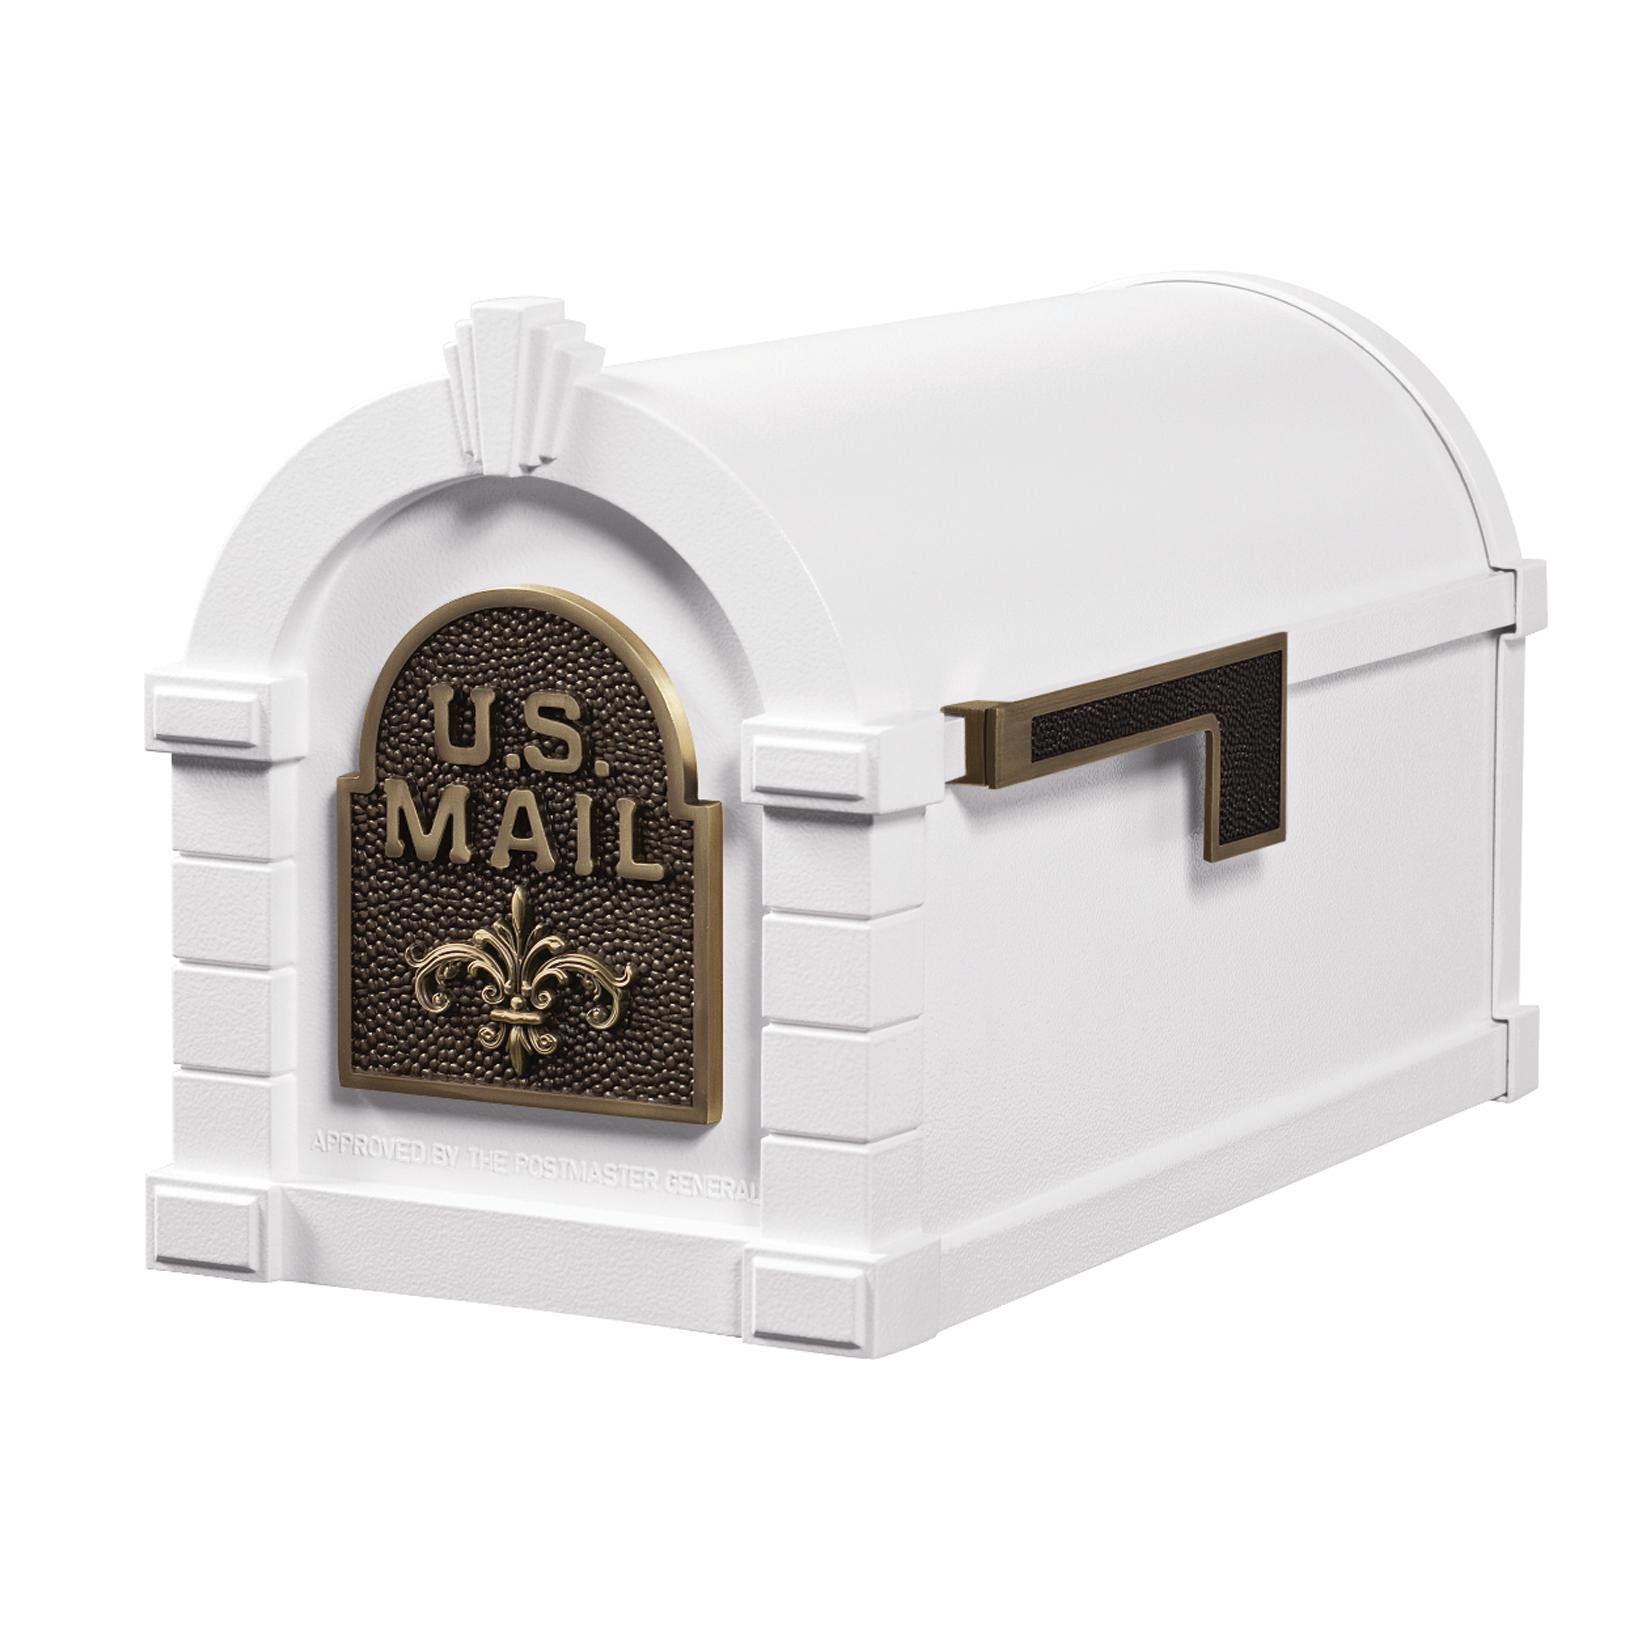 Gaines Fleur De Lis Keystone MailboxesWhite with Antique Bronze